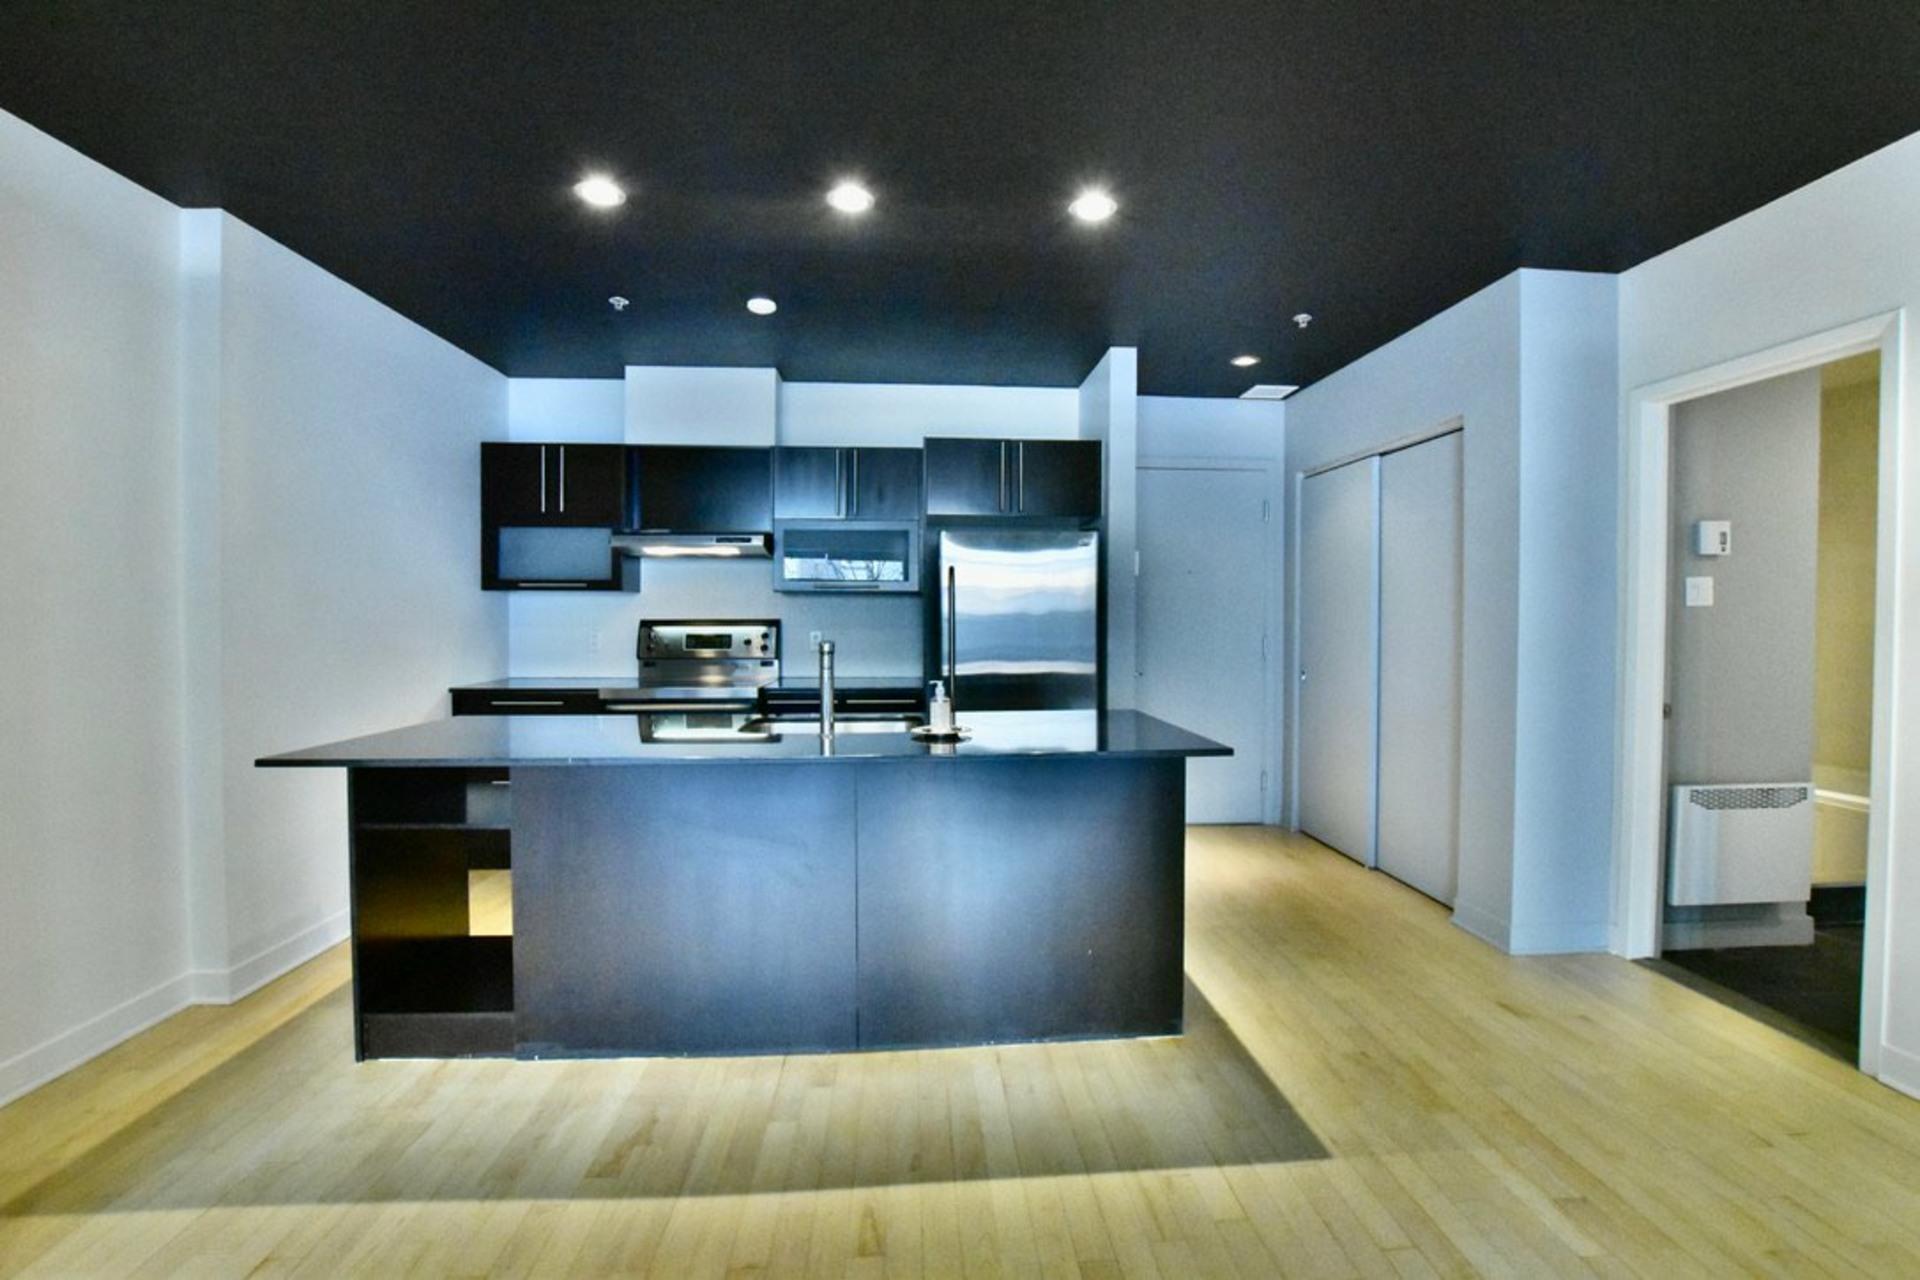 image 9 - Departamento Para alquiler Villeray/Saint-Michel/Parc-Extension Montréal  - 3 habitaciones